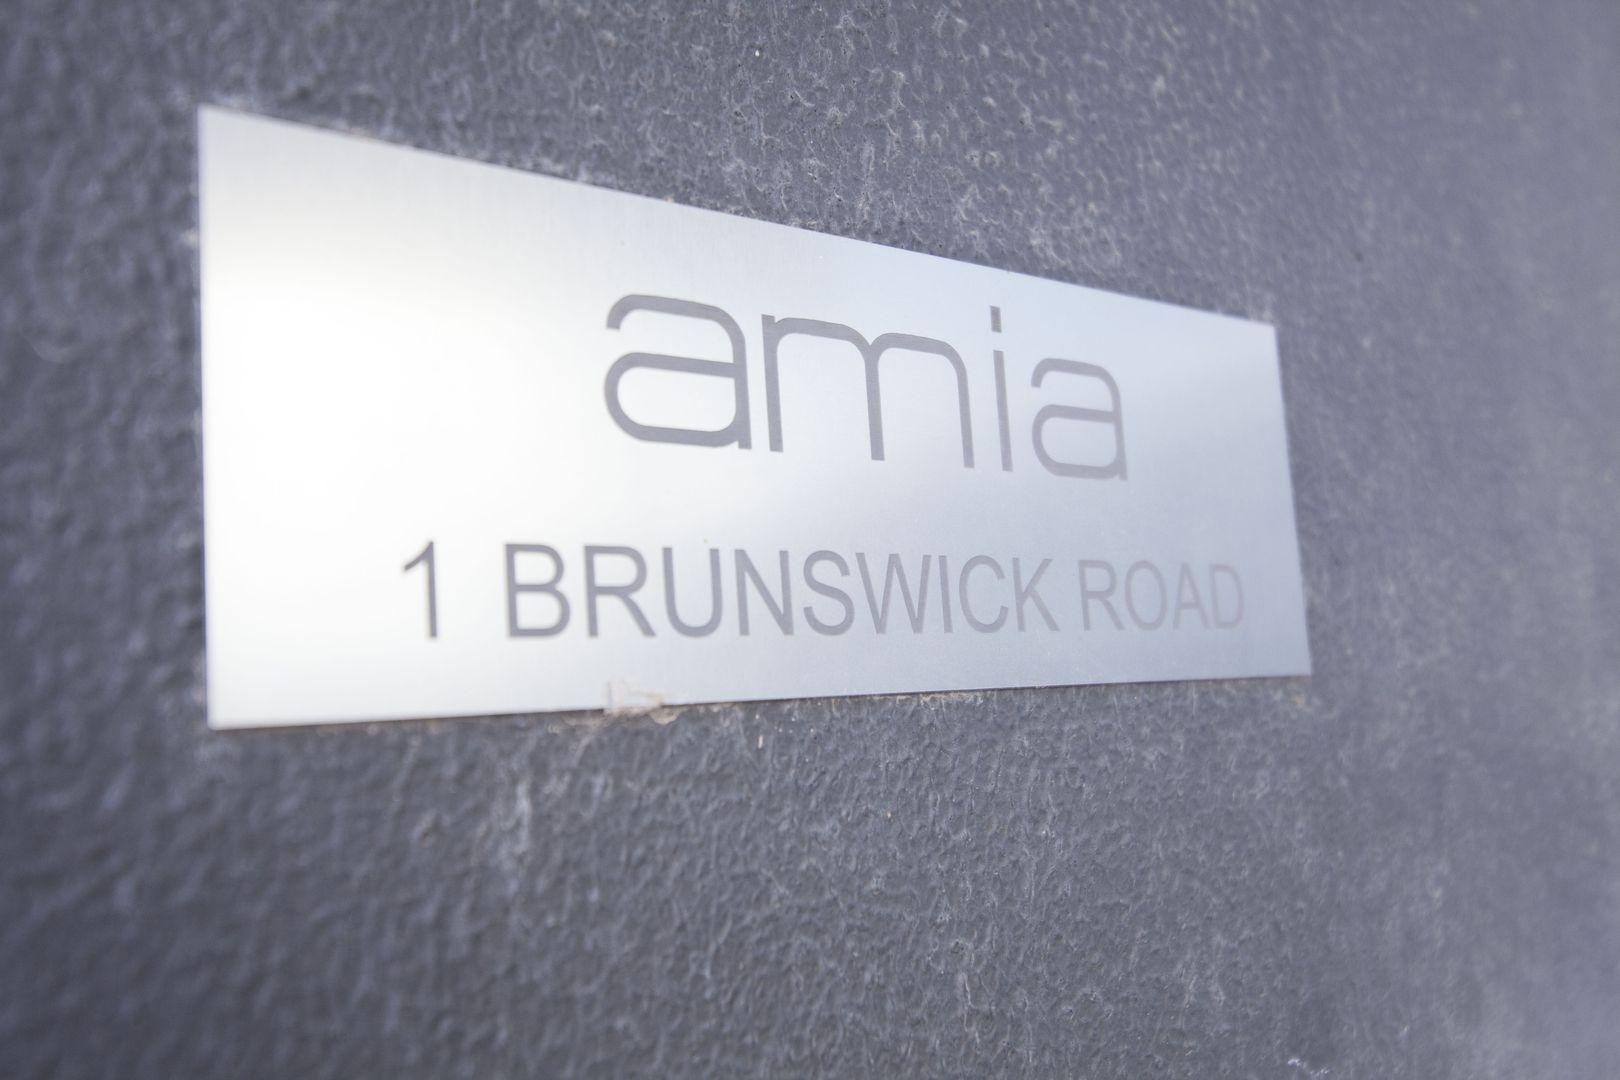 217/1 Brunswick Road, Brunswick East VIC 3057, Image 0